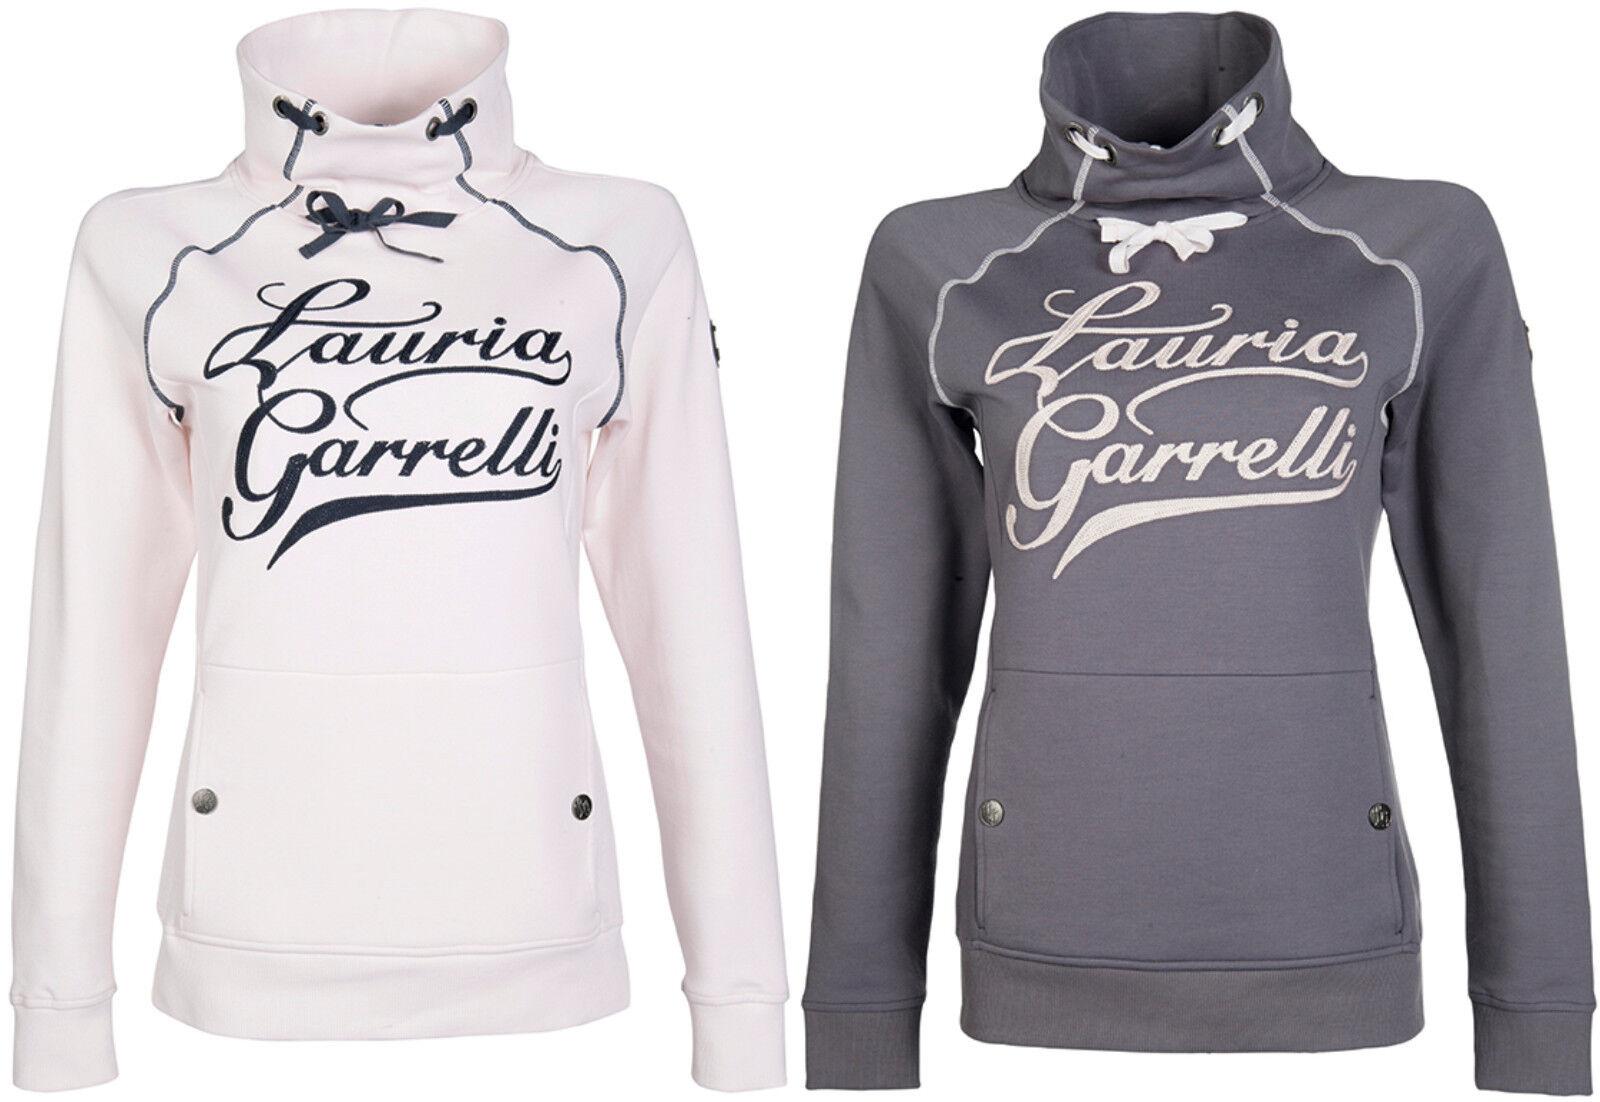 ⭐️  HKM Lauria Garrelli Scotland Dress Shirt Jumper Sweatshirt (9374) ⭐️  looking for sales agent